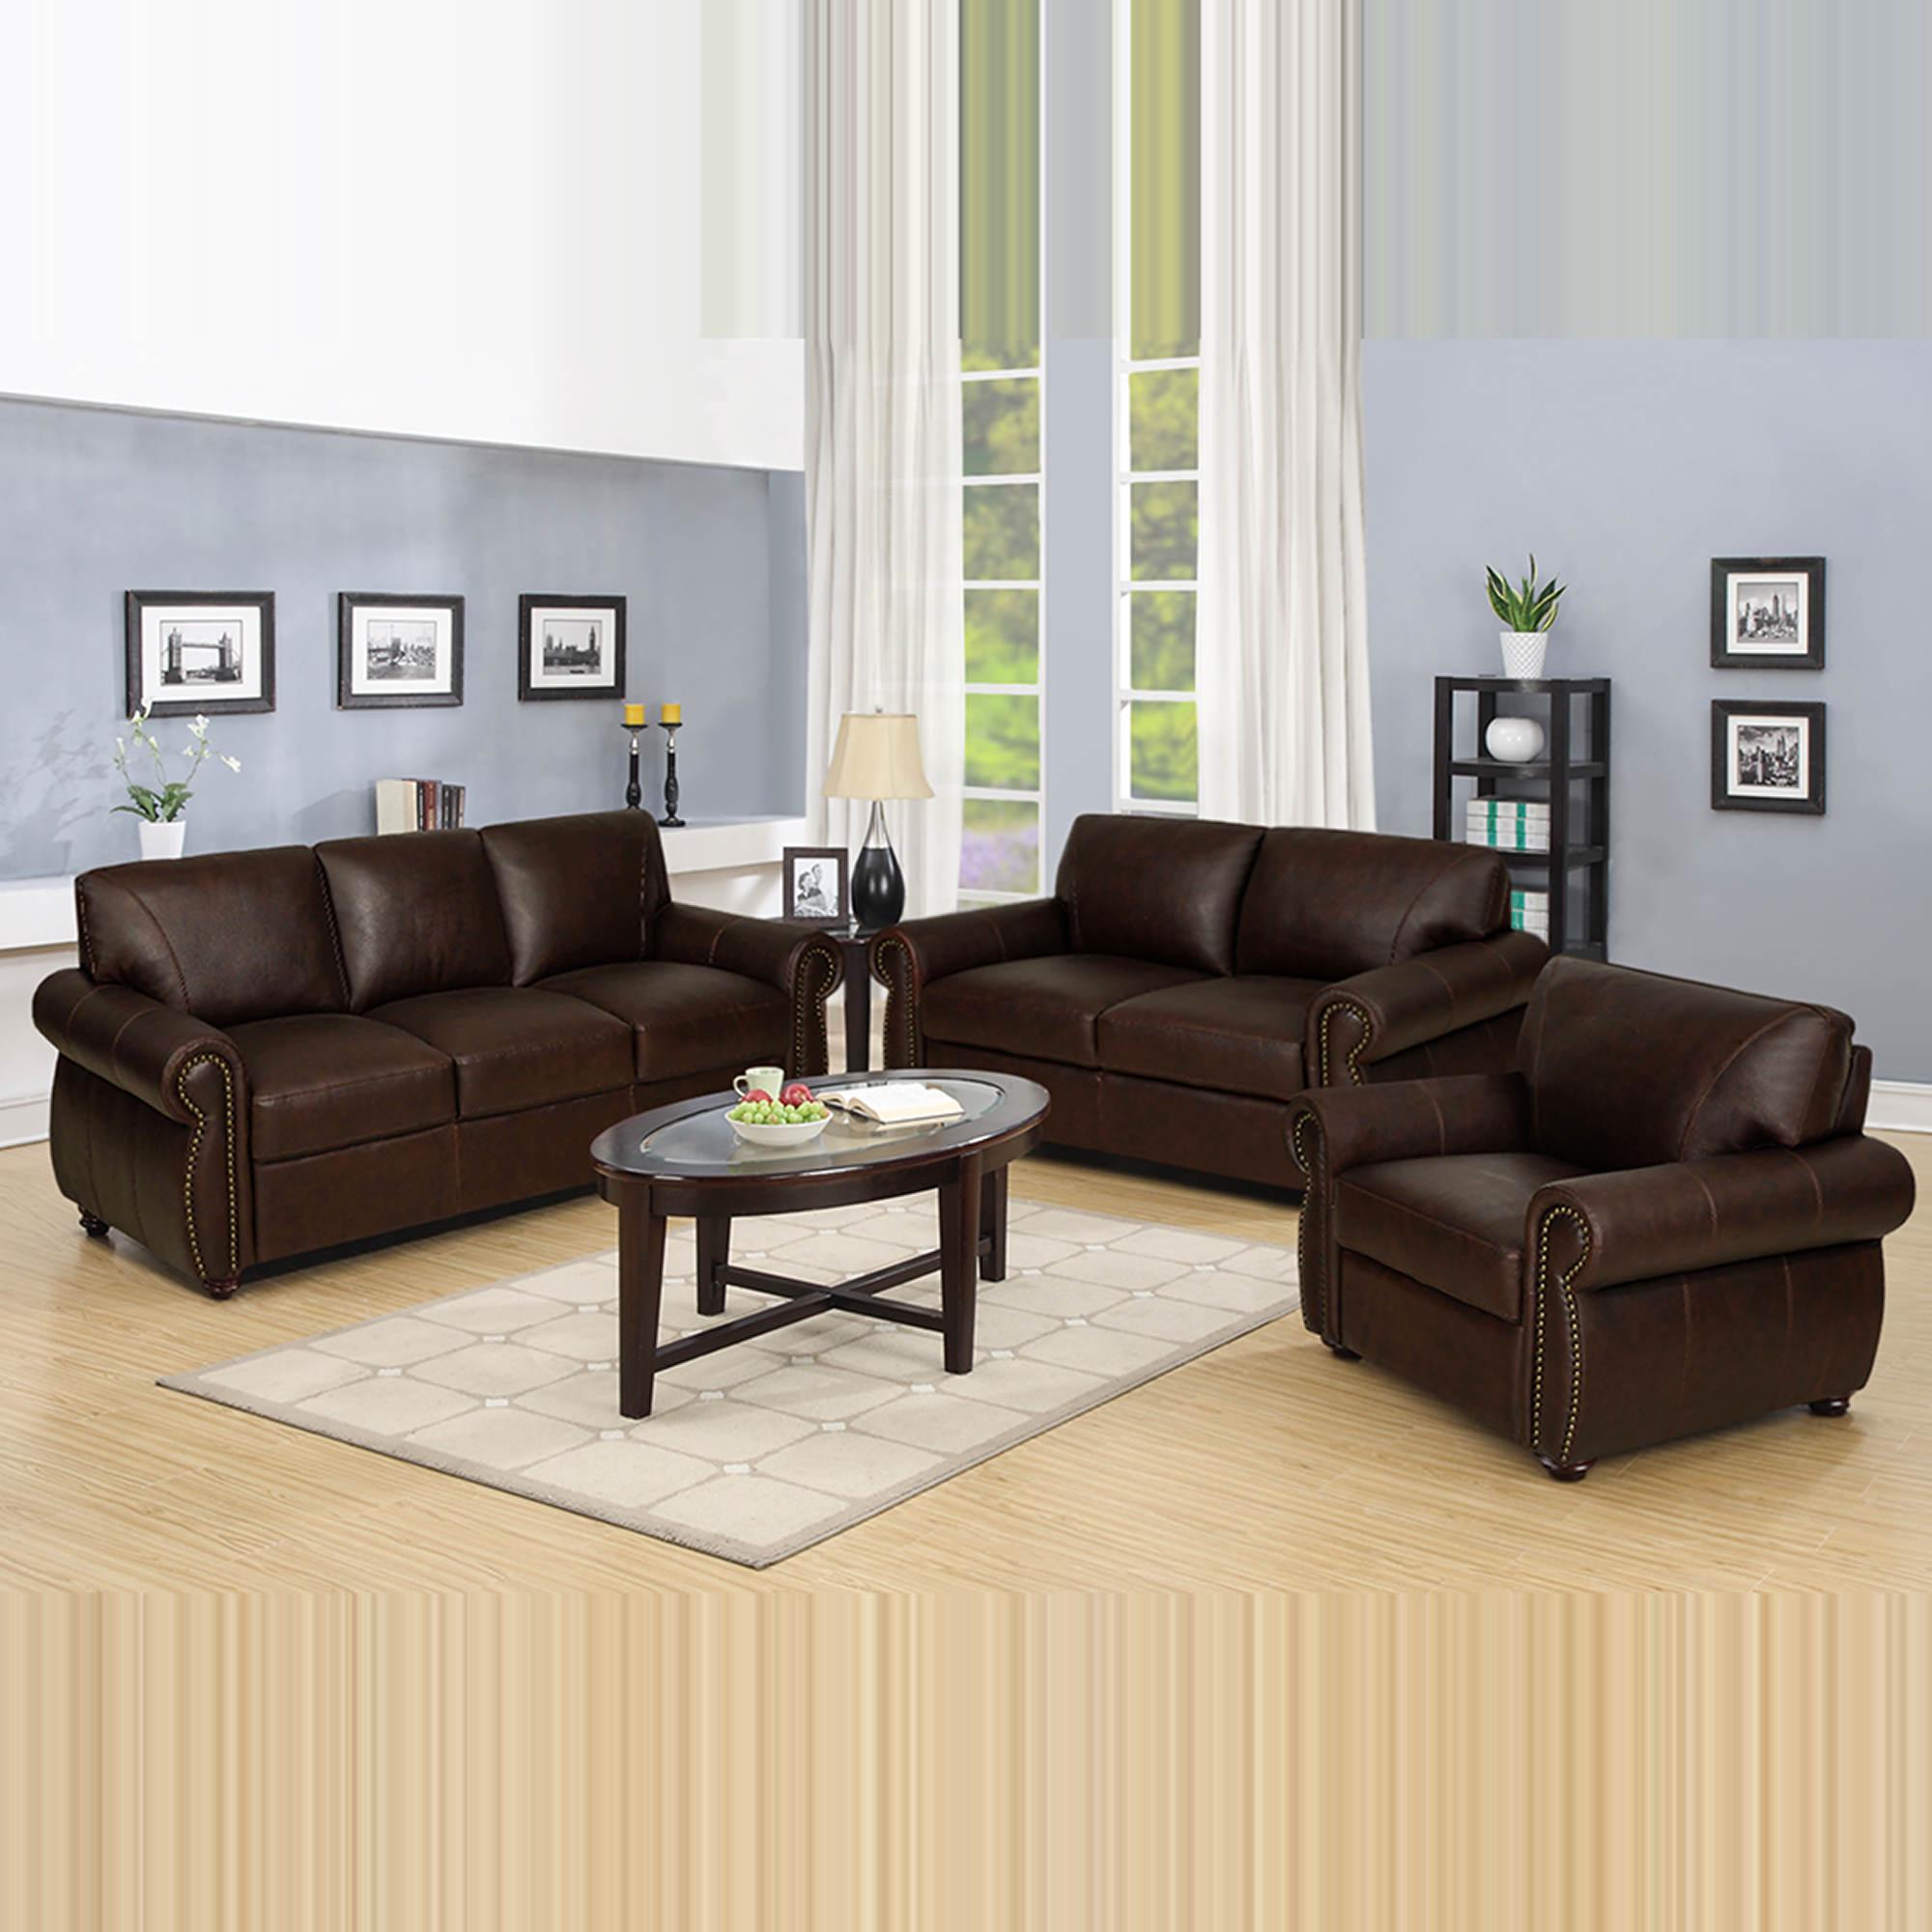 Chocolate Brown Living Room Set